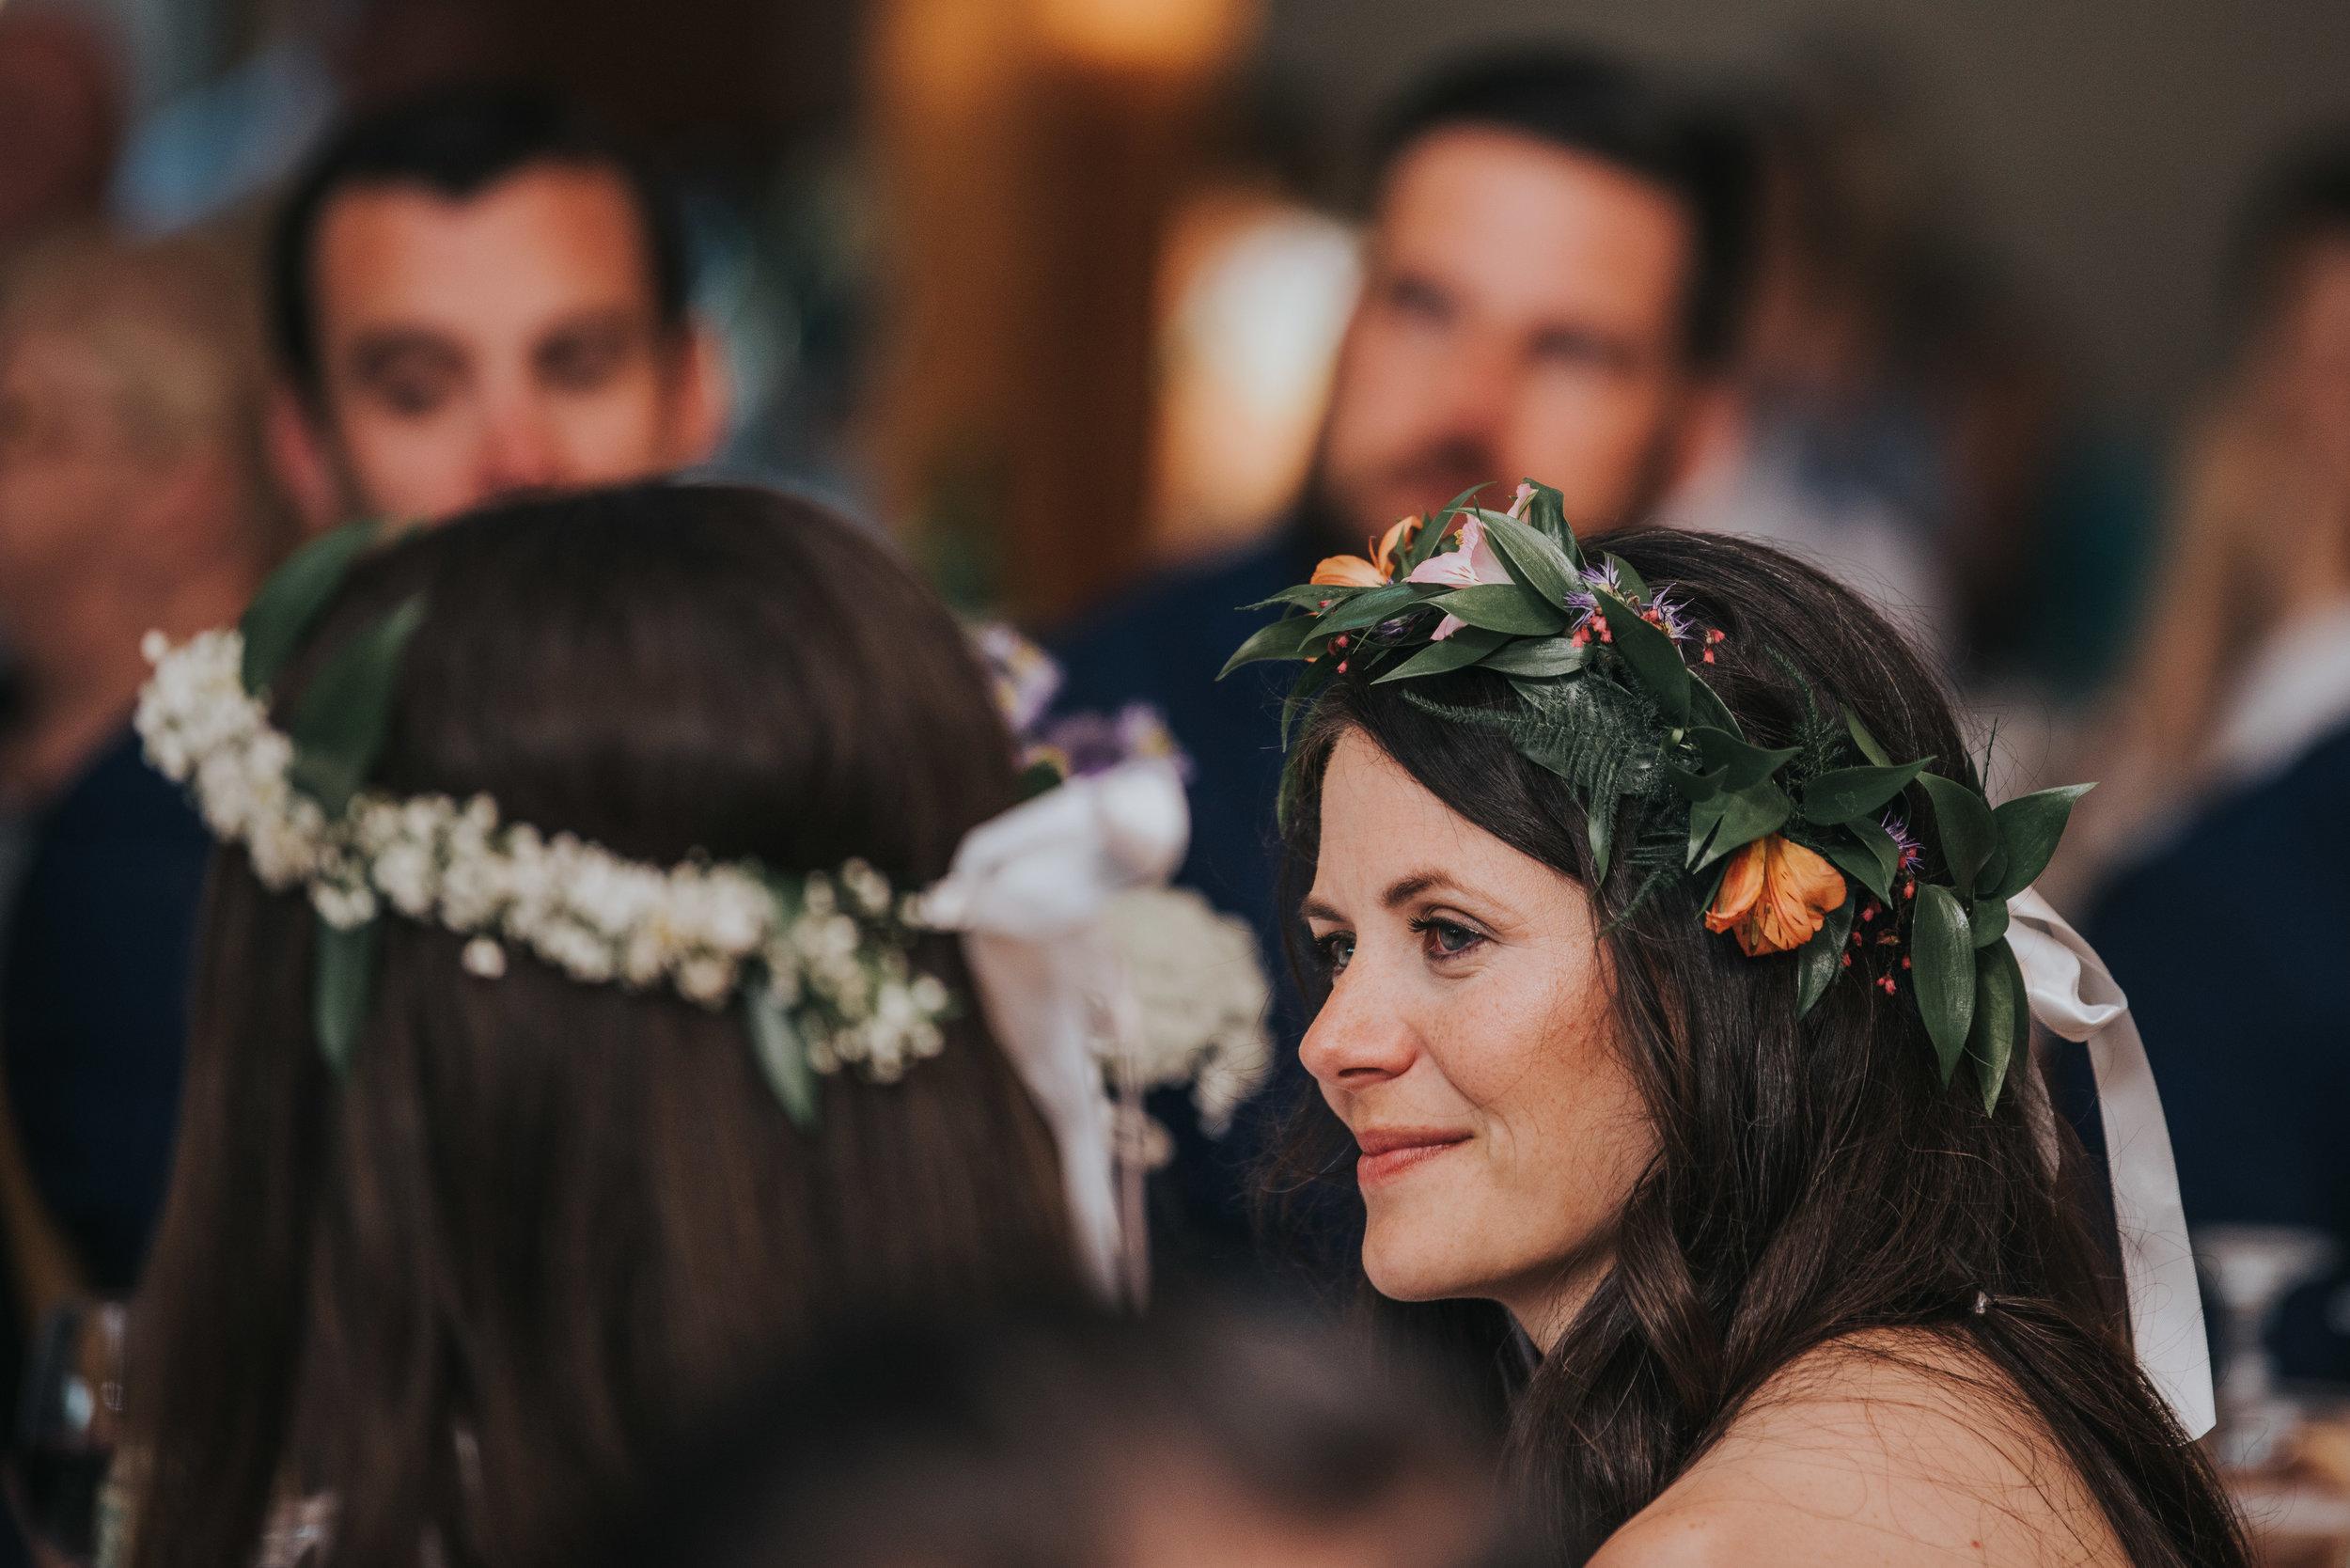 bride-at-reception-rustic-cabin-toronto-bohemian-boho-outdoor-summer-wedding-documentary-wedding-photography-by-willow-birch-photo.jpg